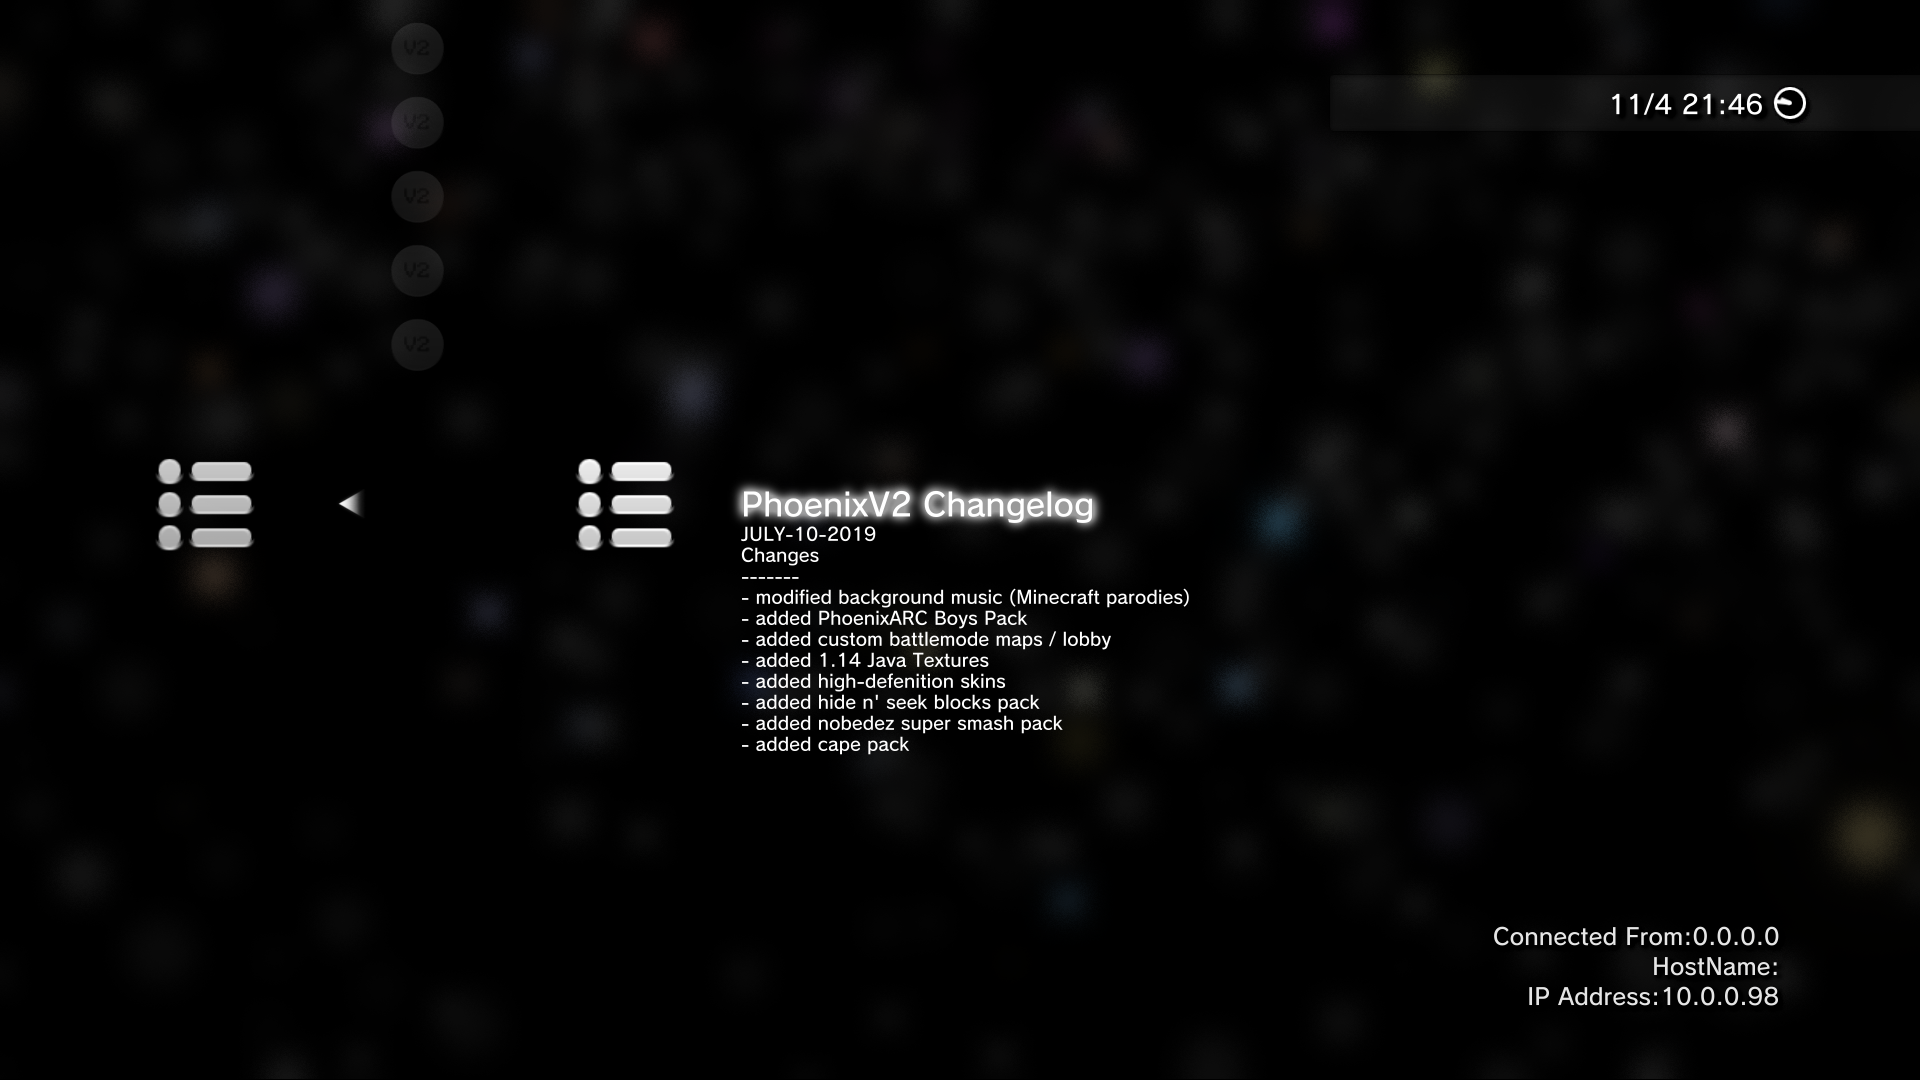 screenshot_2019_11_04_21_46_07.png